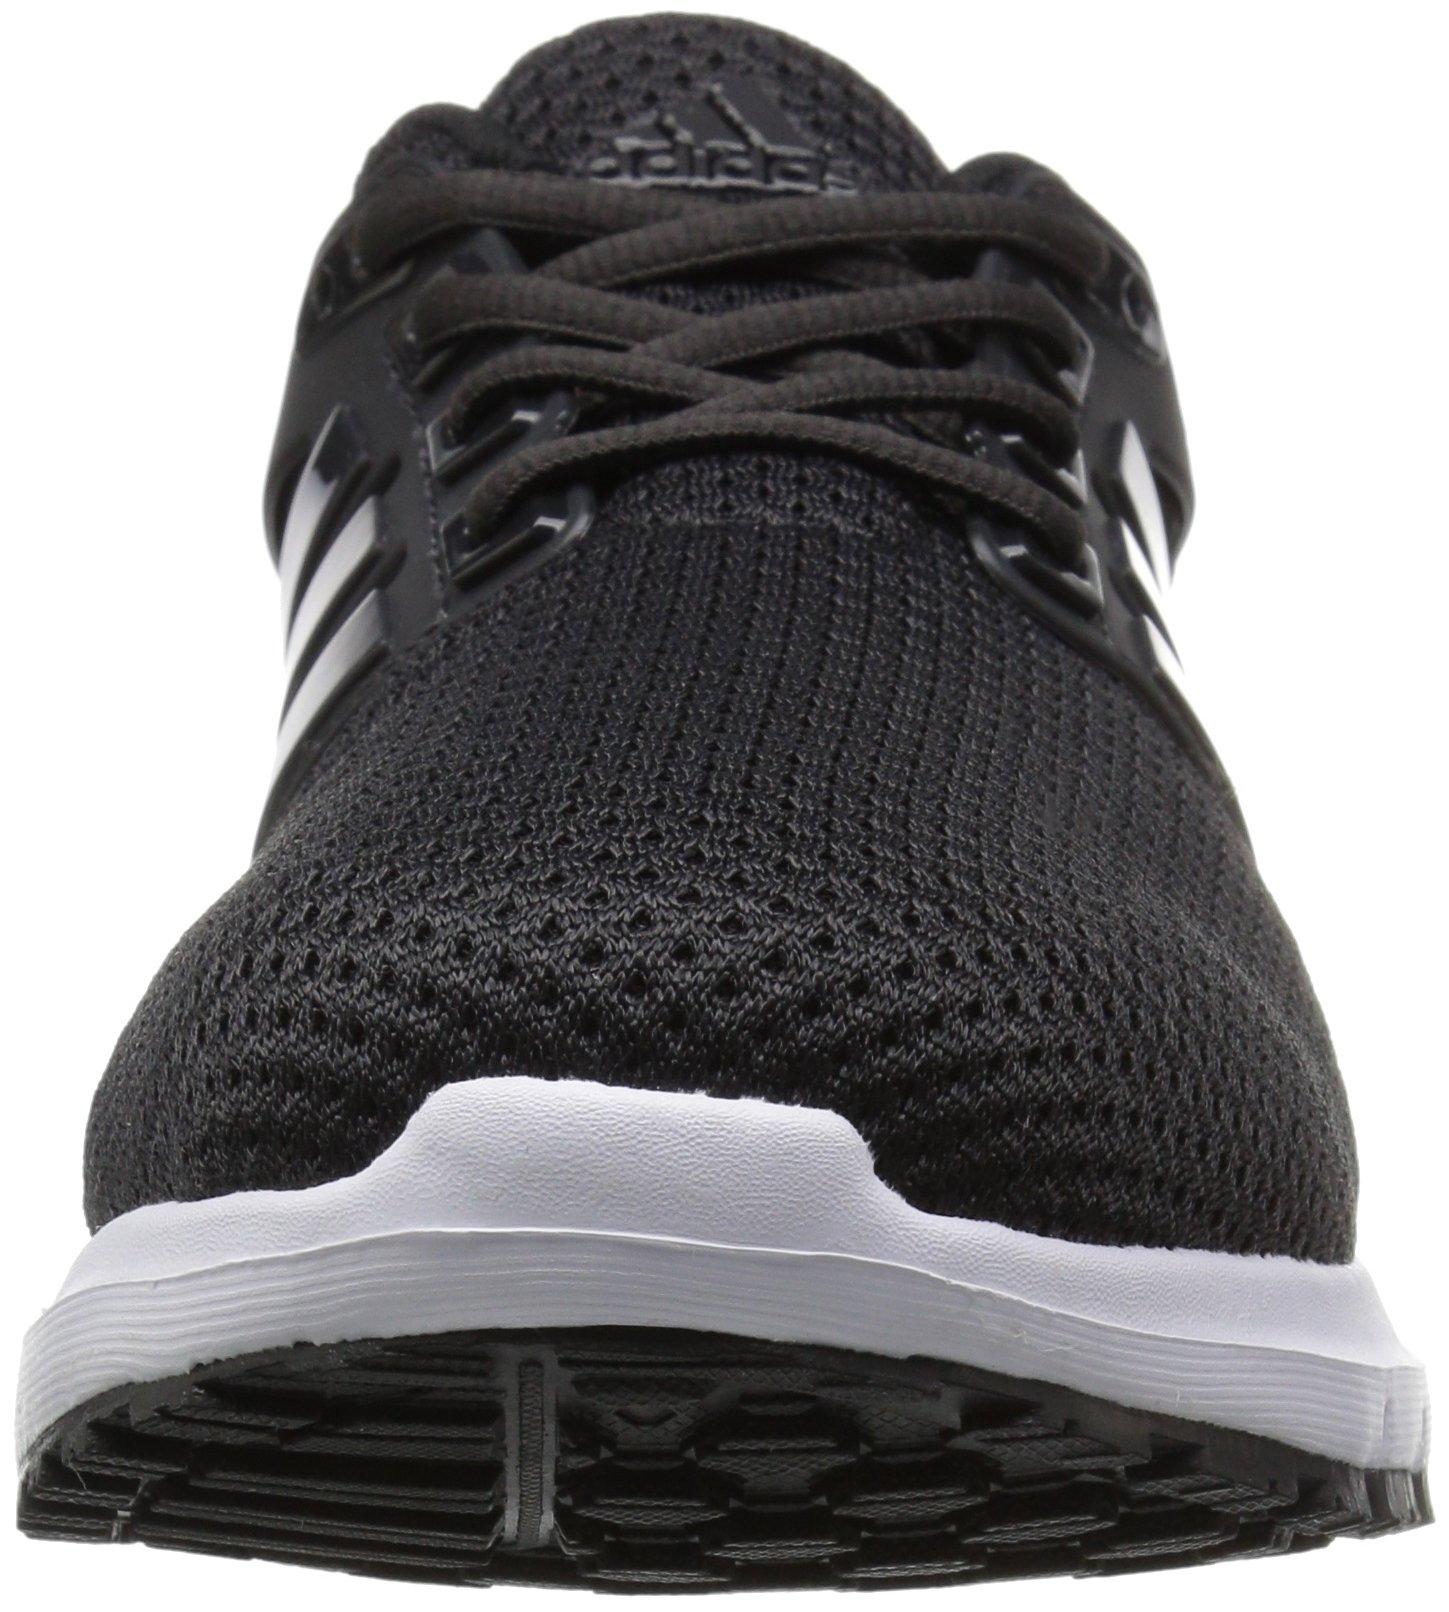 adidas  Men's Energy Cloud Wide m Running Shoe, BLACK/UTILITY BLACK/WHITE, 10.5 2E US by adidas (Image #4)